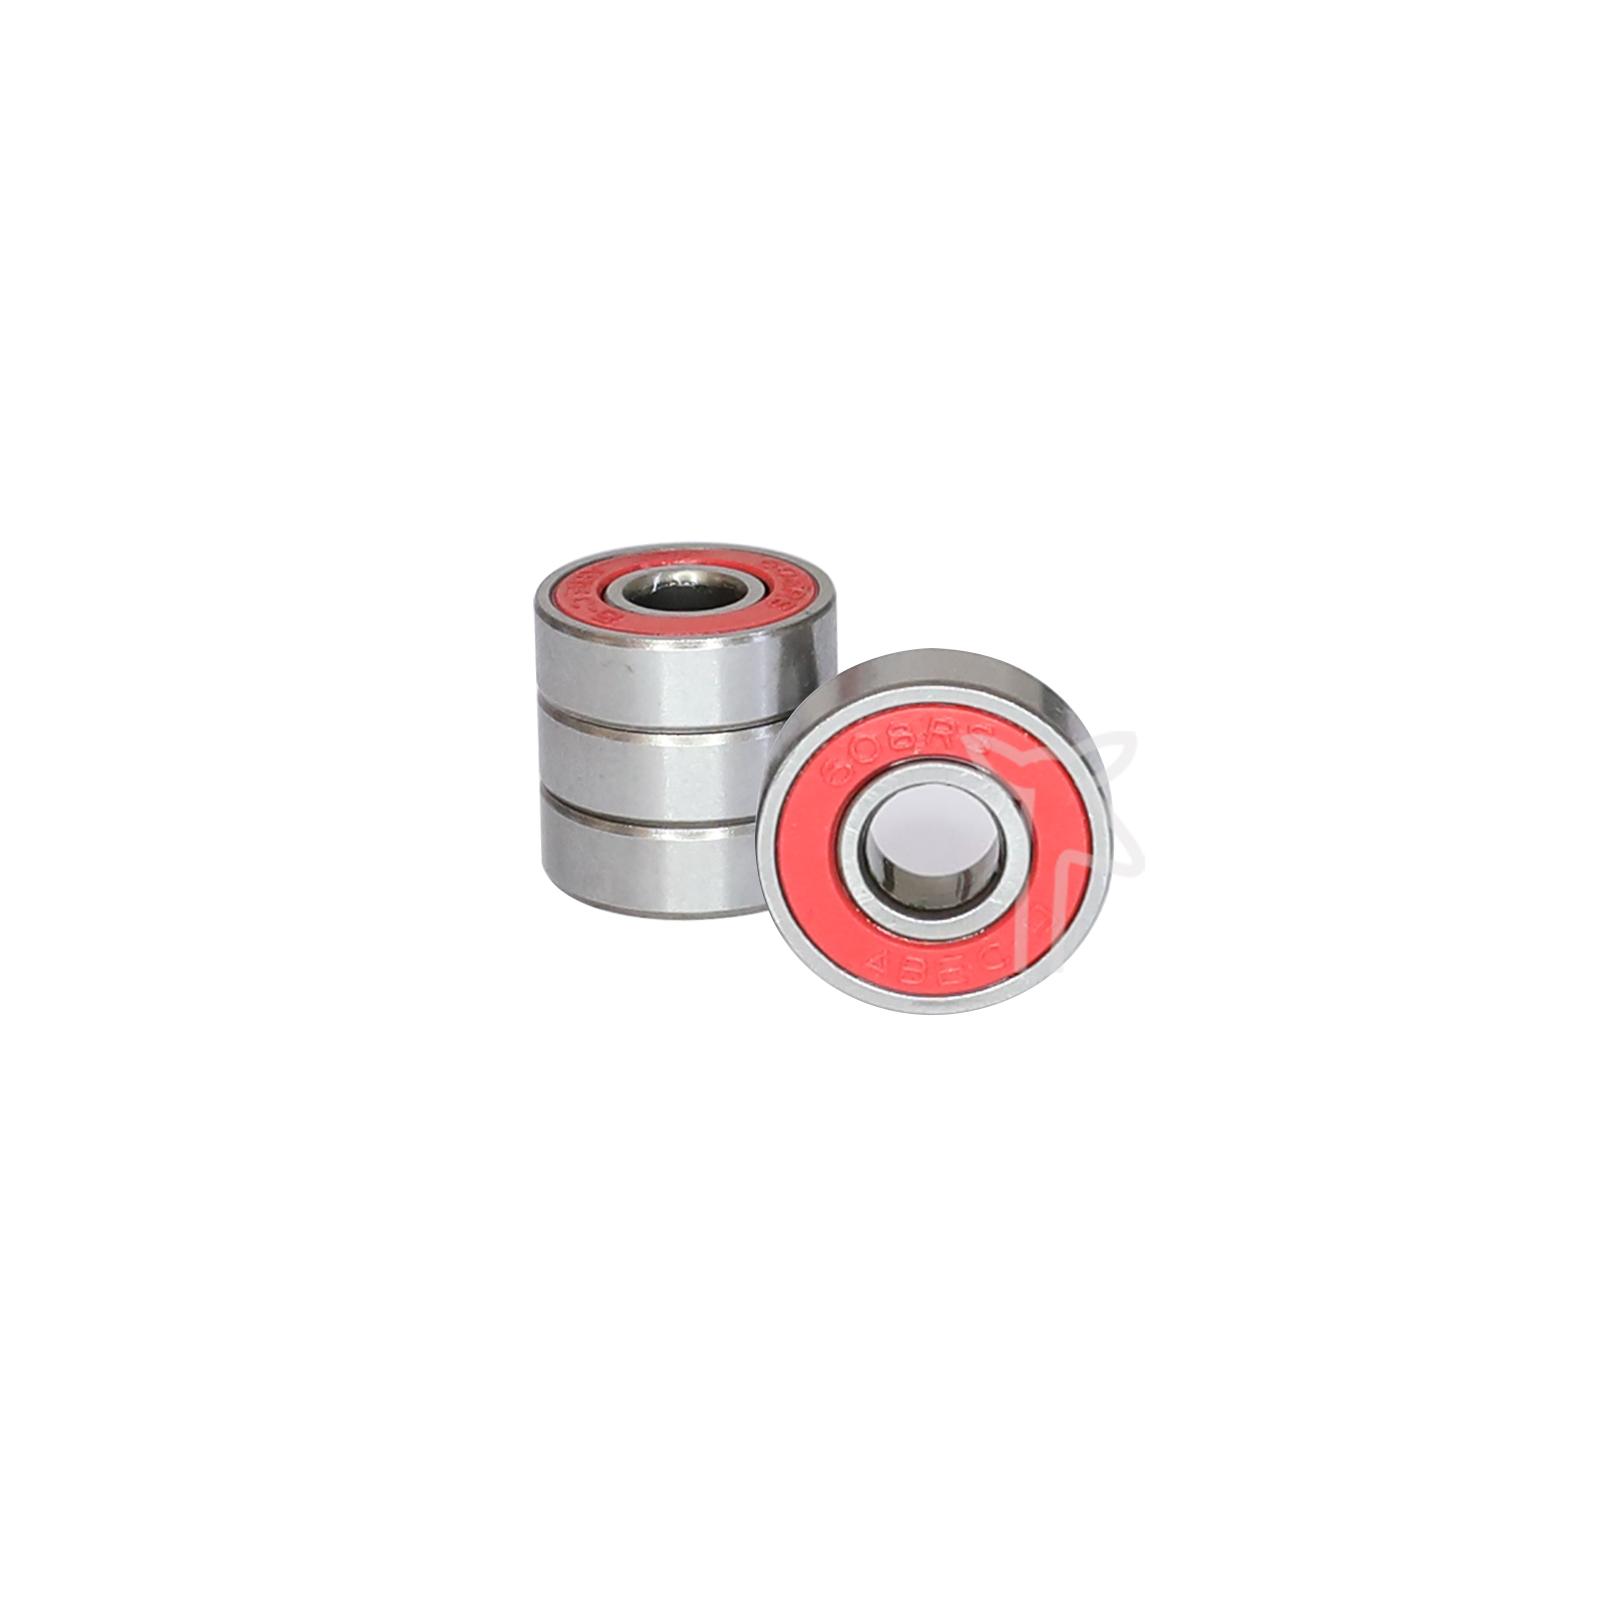 608zz Abec-9 Bearing for 3D Printer Filament Spool Holders